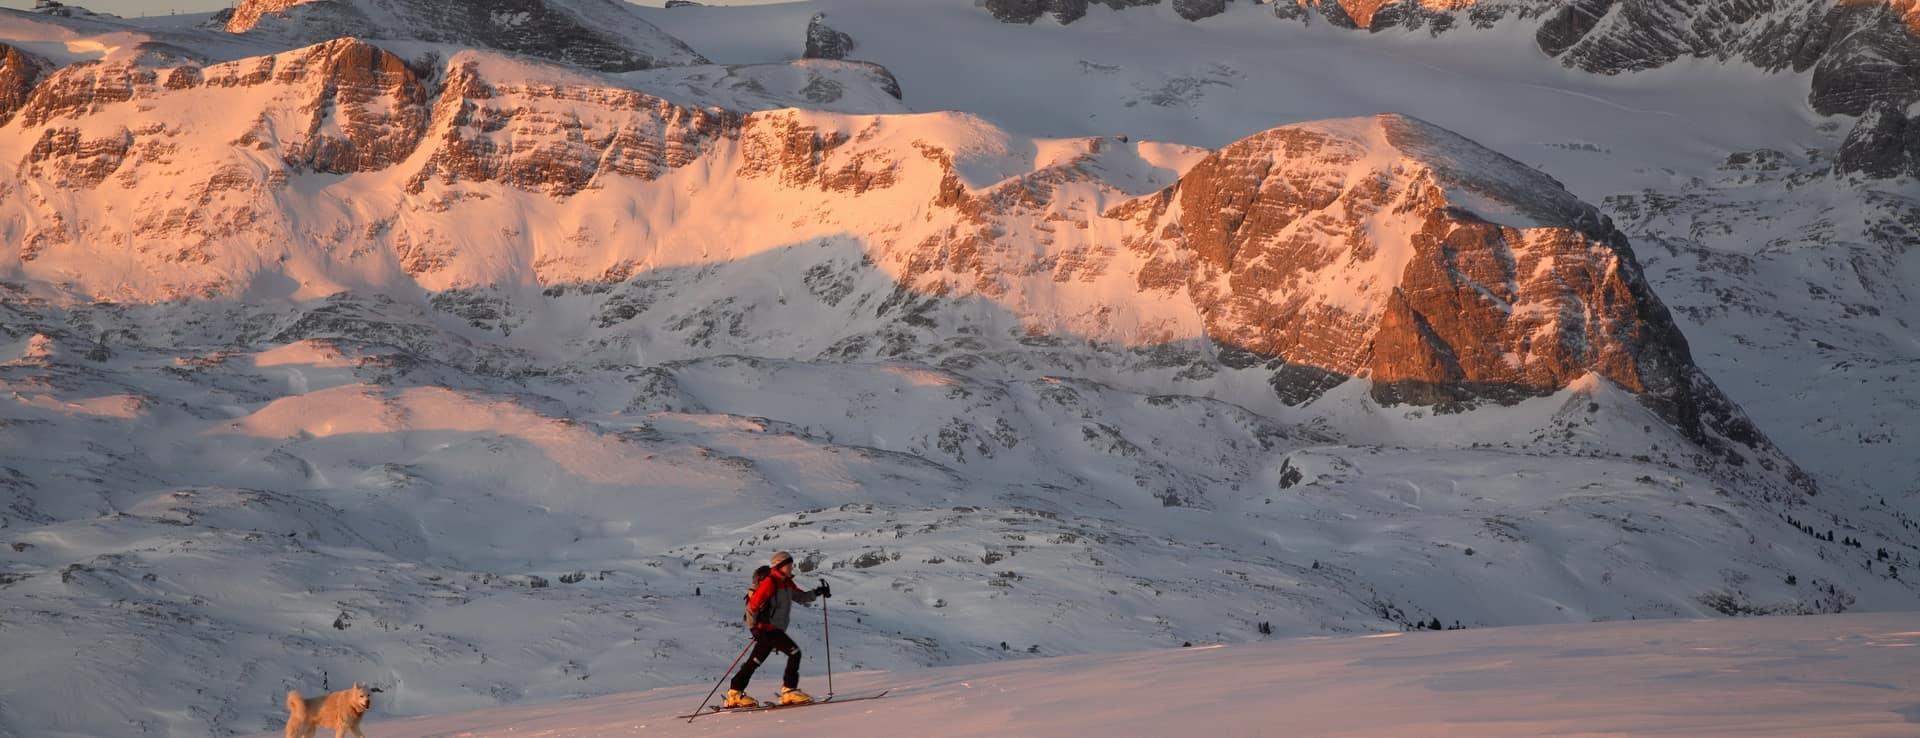 Vintertour vid Krippenstein i skidtourenparadis Salzkammergut